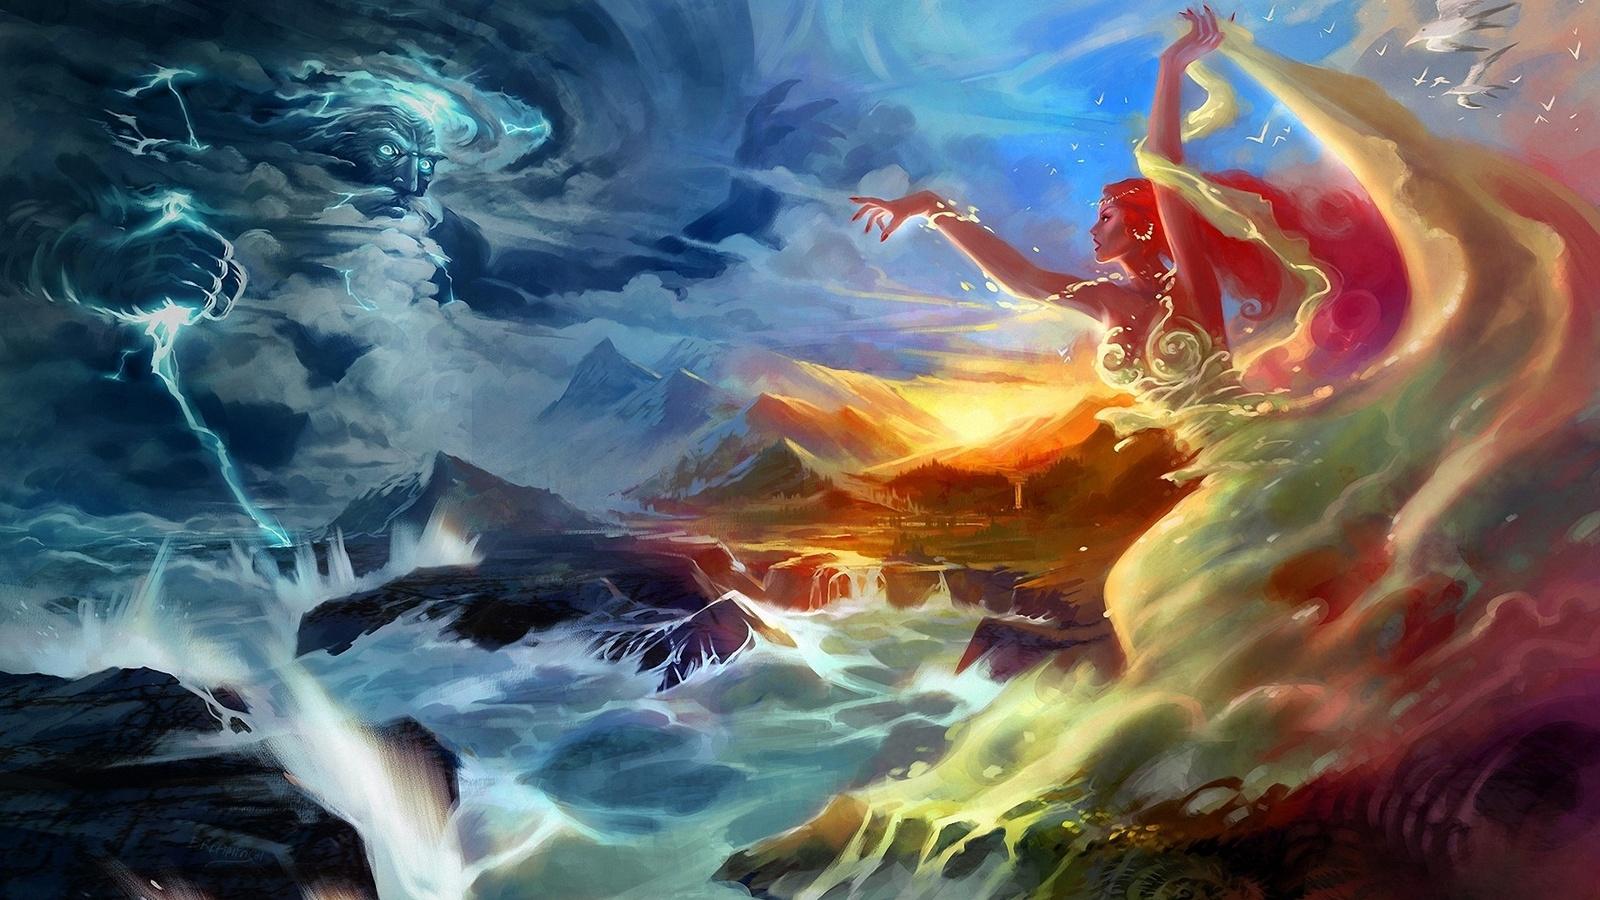 девушка, jian guo, боги, молния, чайки, горы, буря, Арт, море